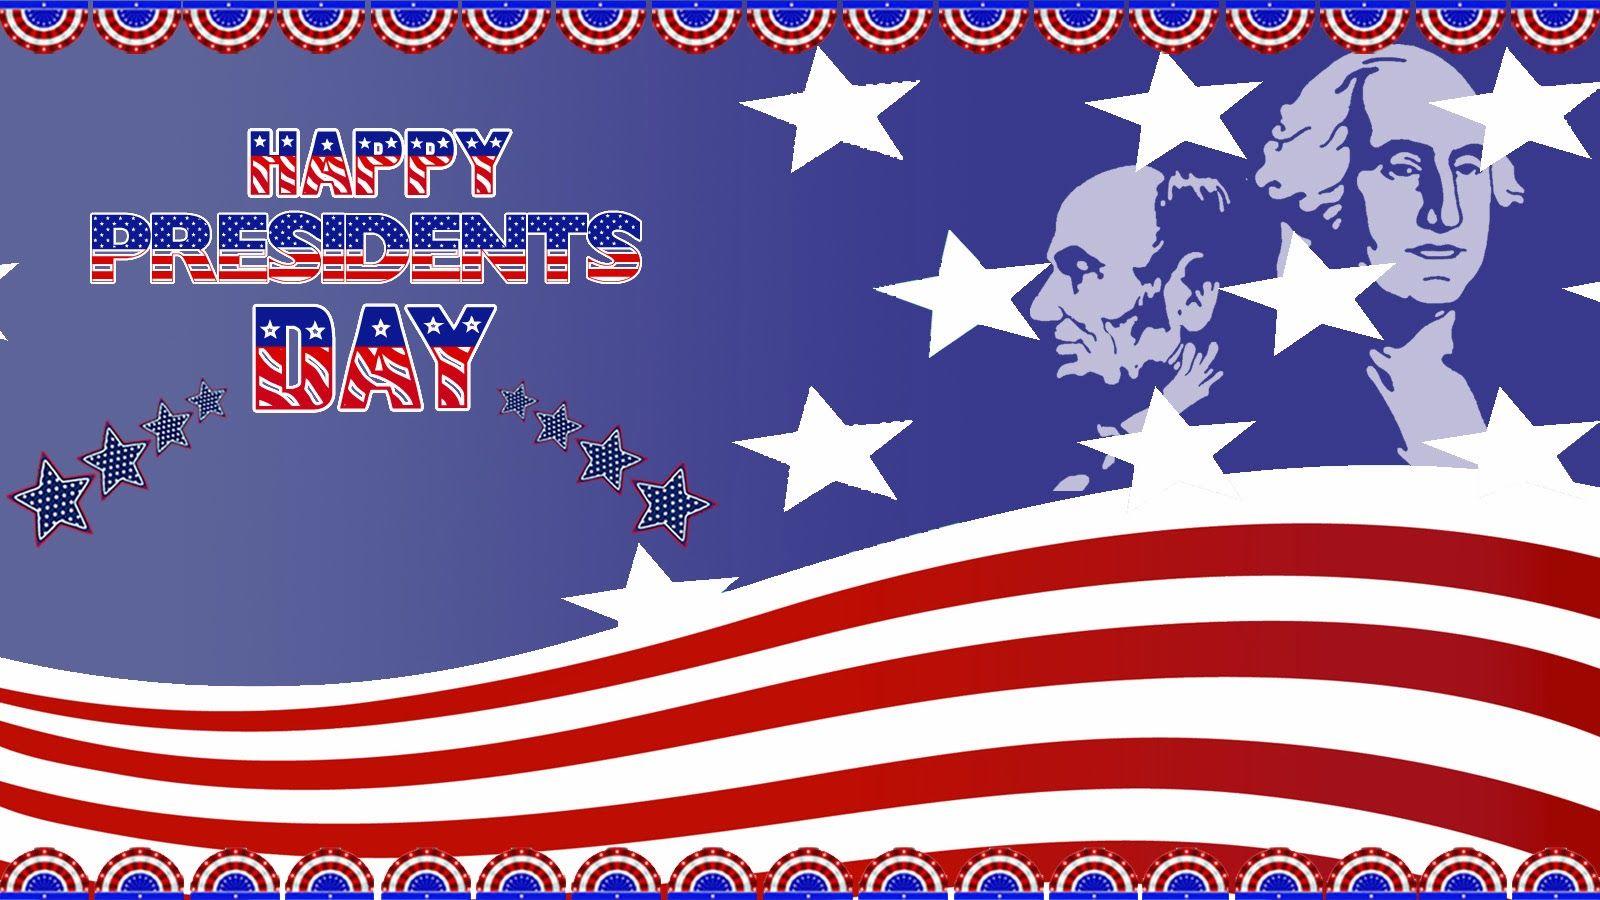 Happy Presidents Day